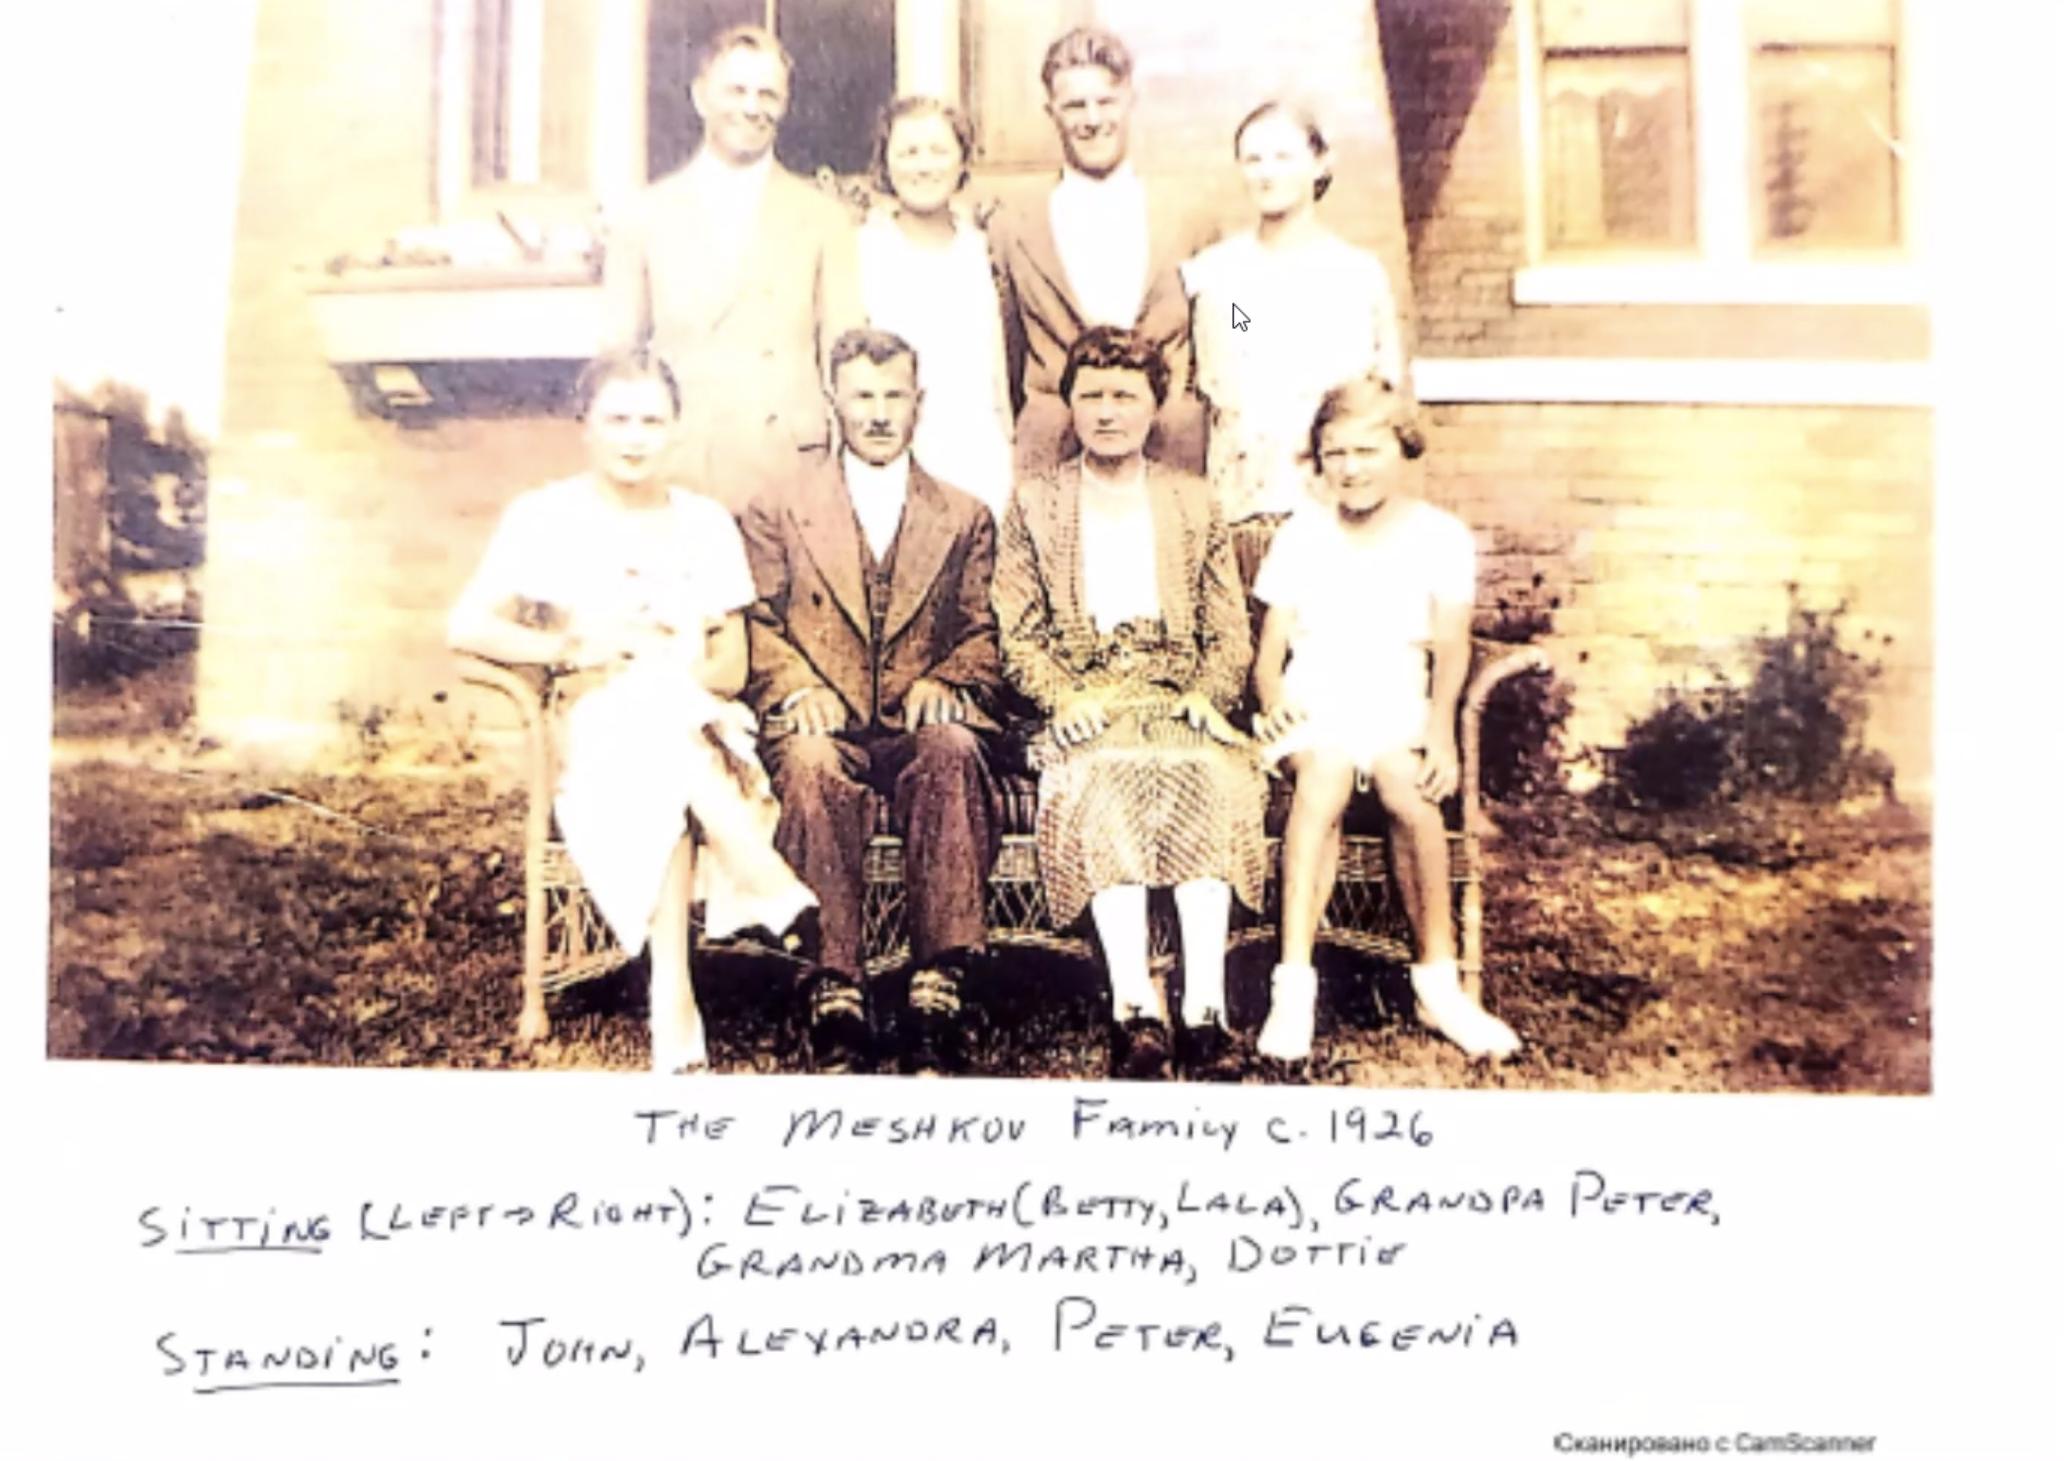 Dr. Garza Family Picture 1 copy - Family brings Russian culture to Nebraska